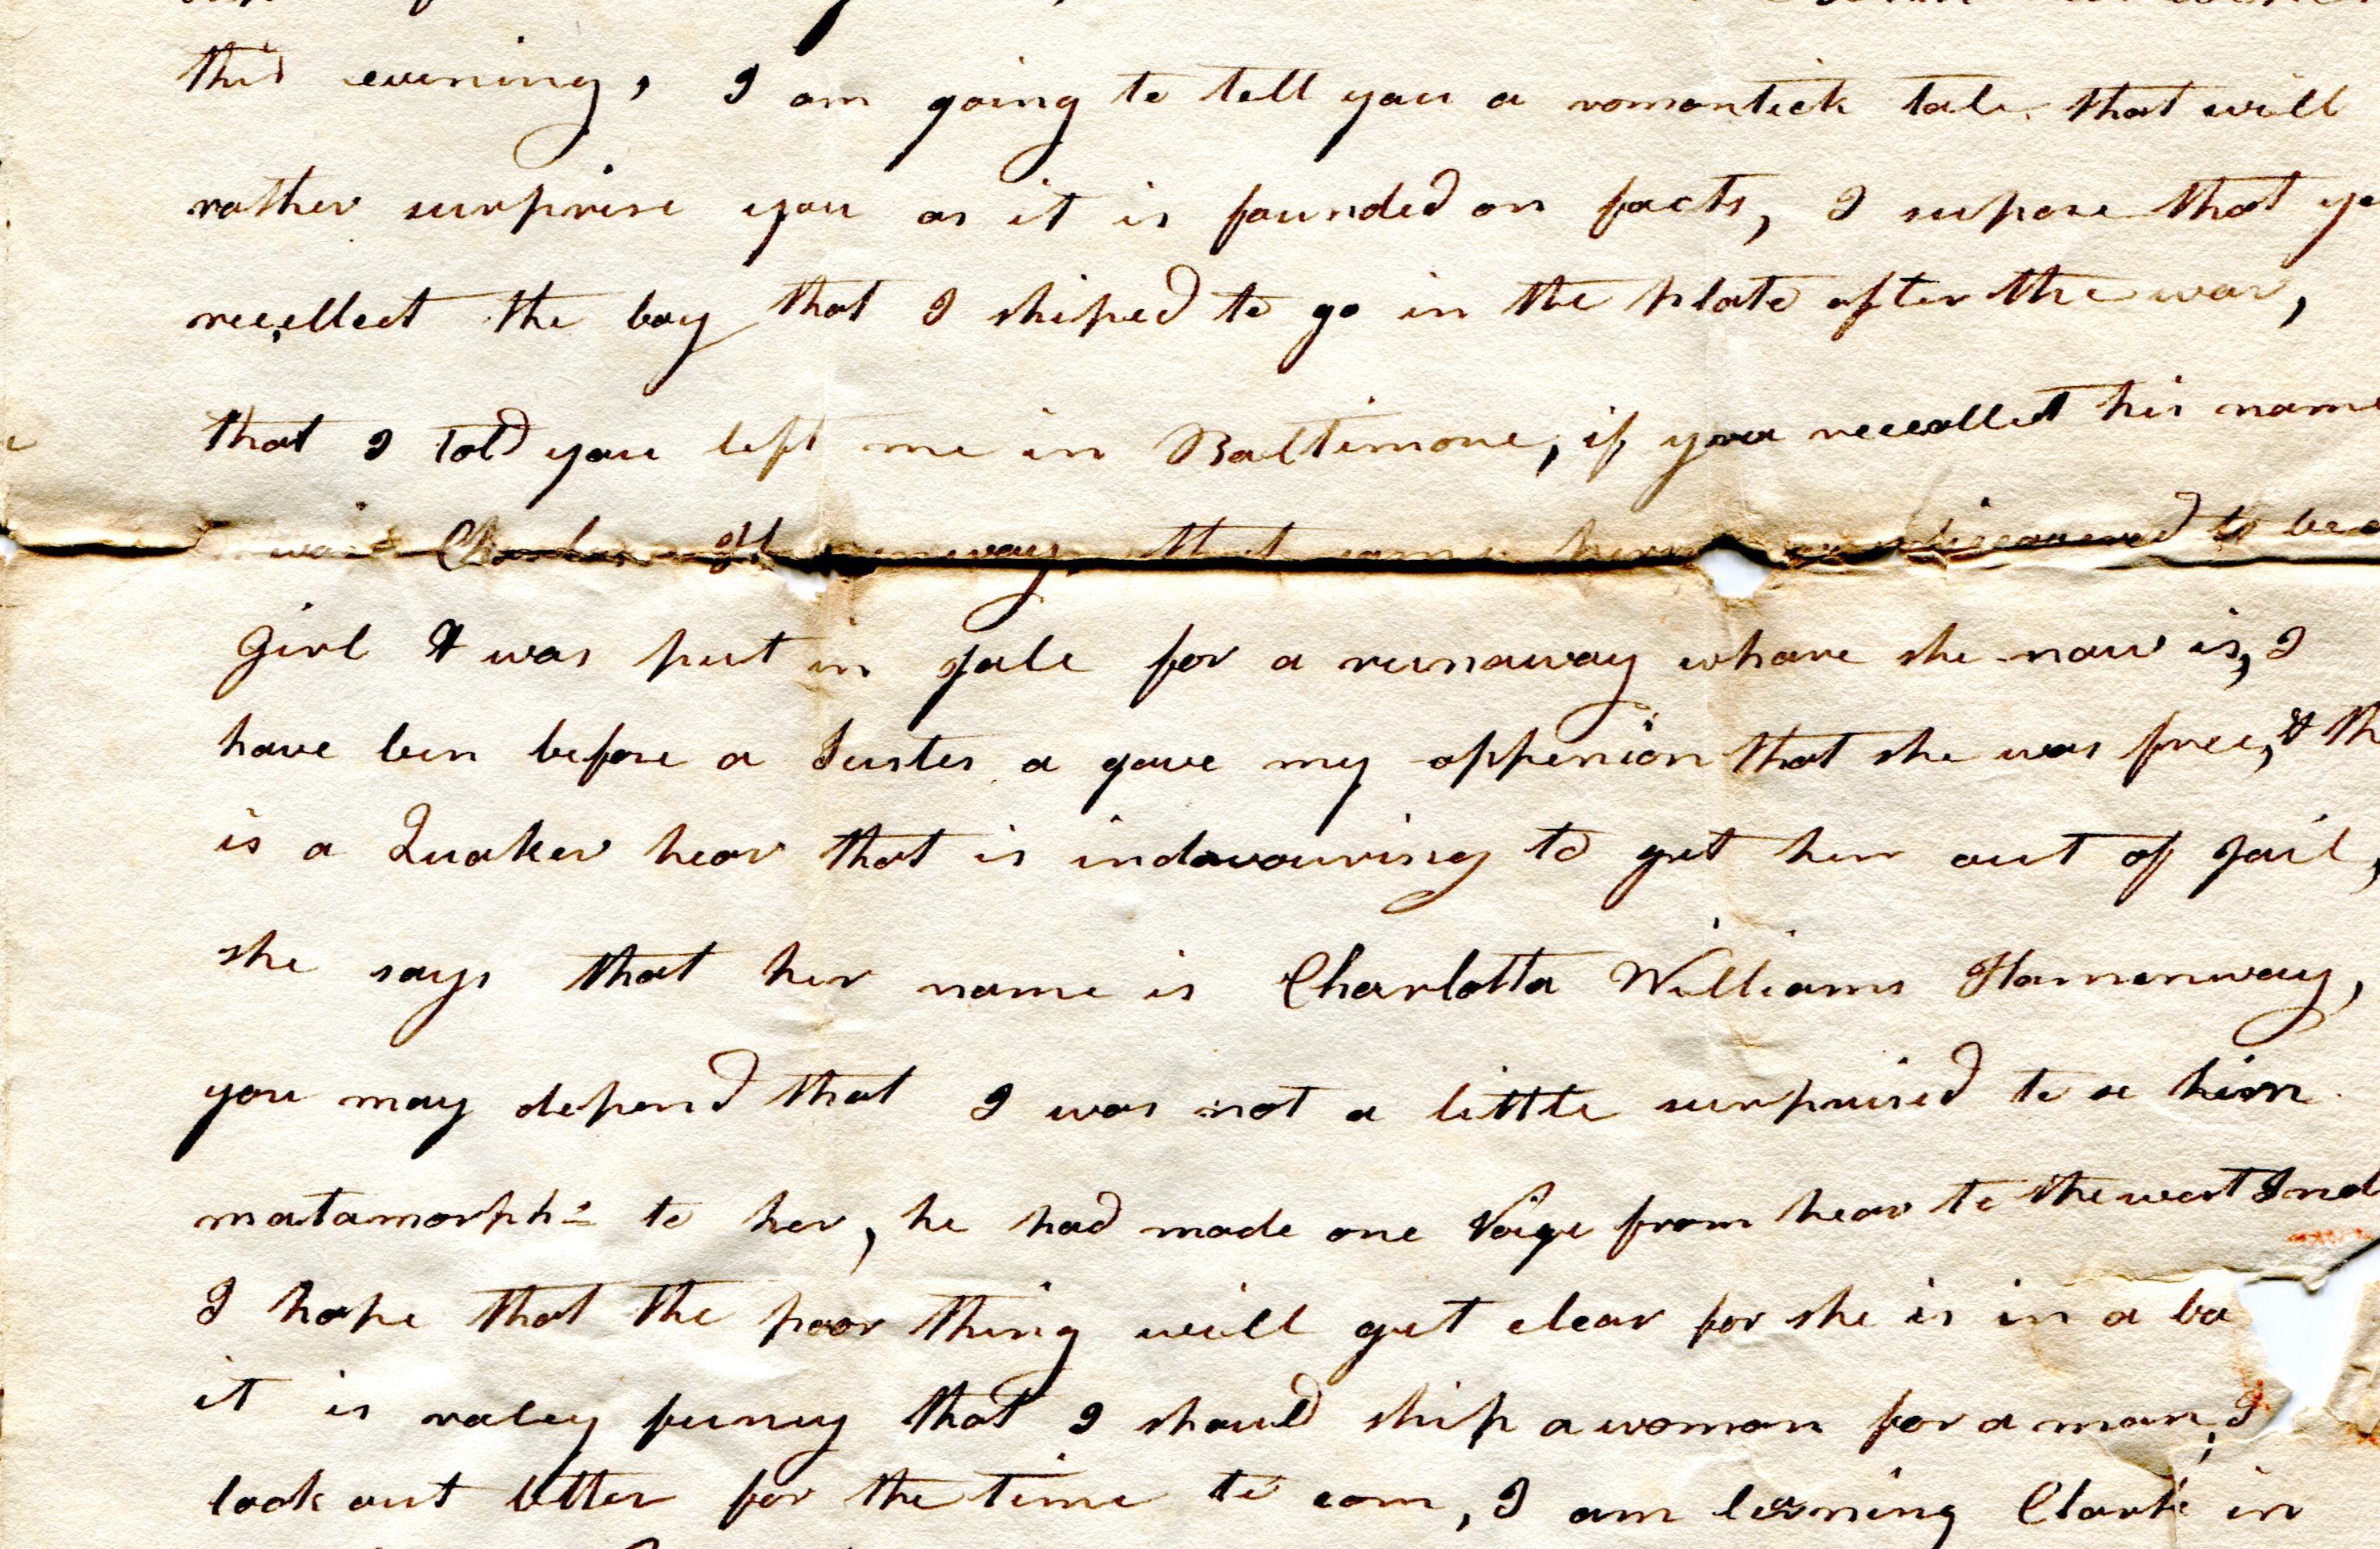 an analysis of letter by mr john smith Phrases business letter mr adam smith, smith's plastics, 8 crossfield road, selly oak, birmingham dear john smith, beste meneer jansen.